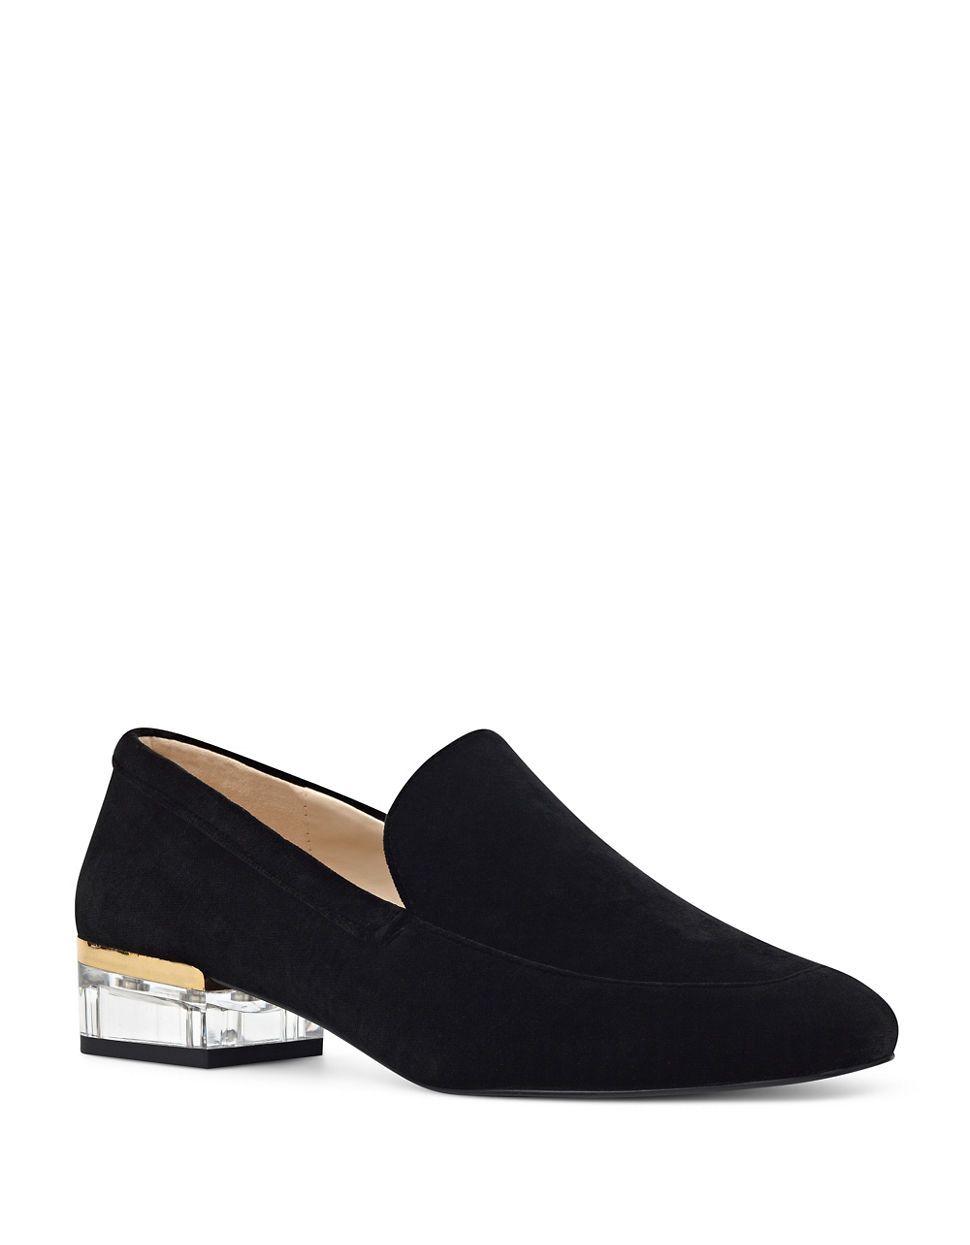 4181b7b20 Shoes